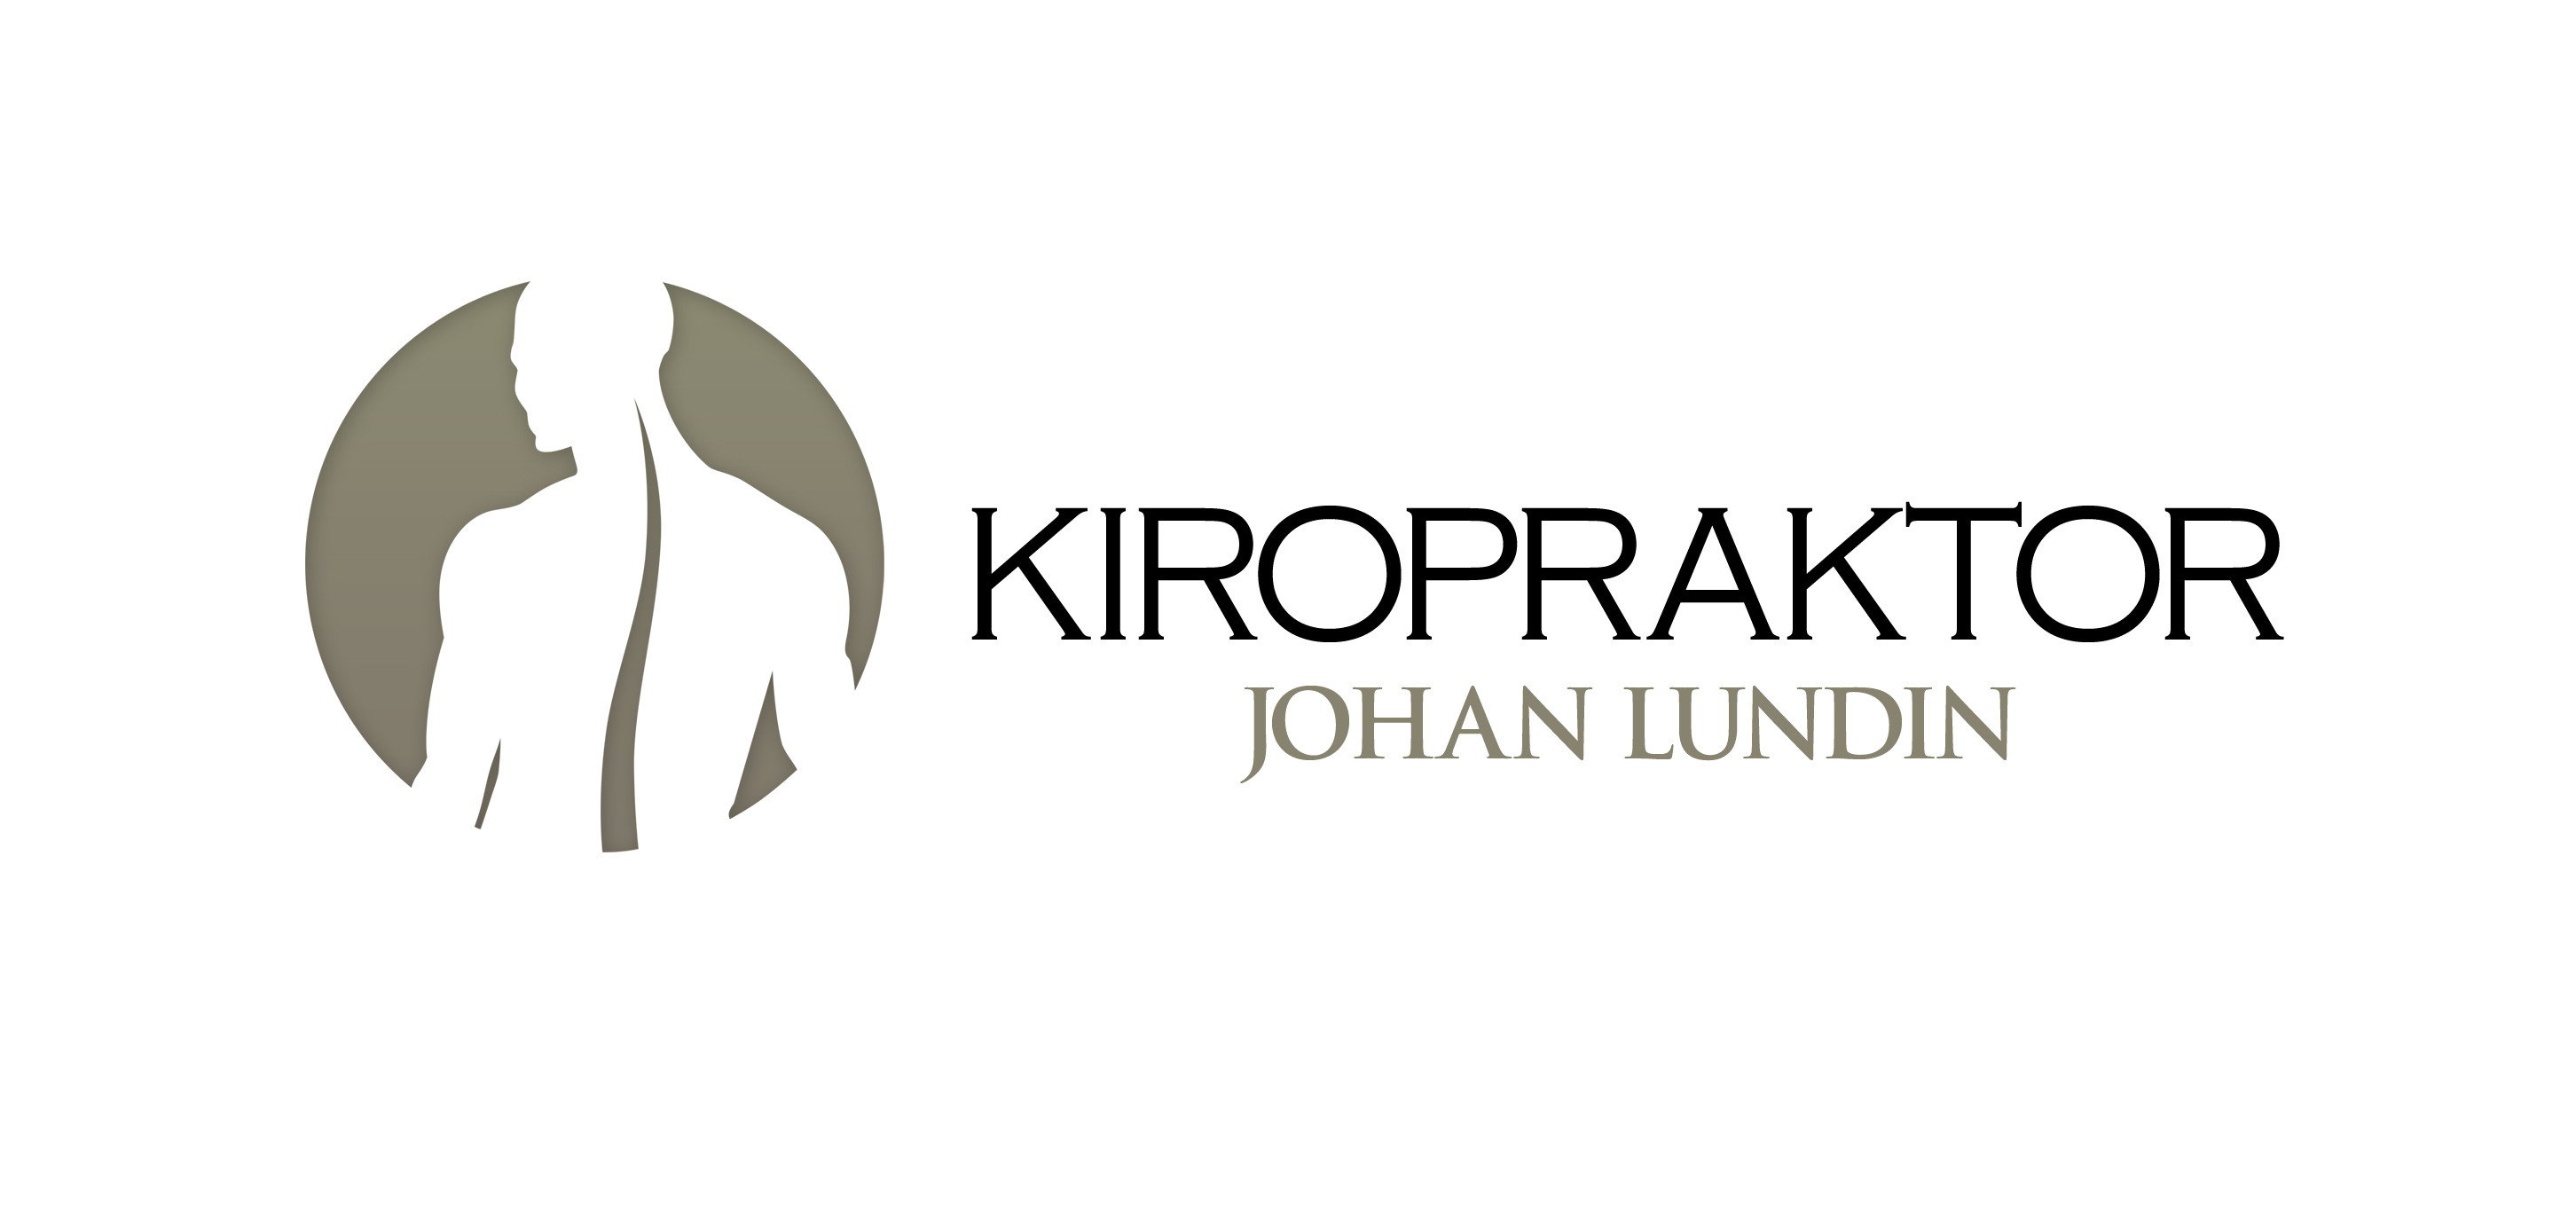 Kiropraktor Johan Lundin